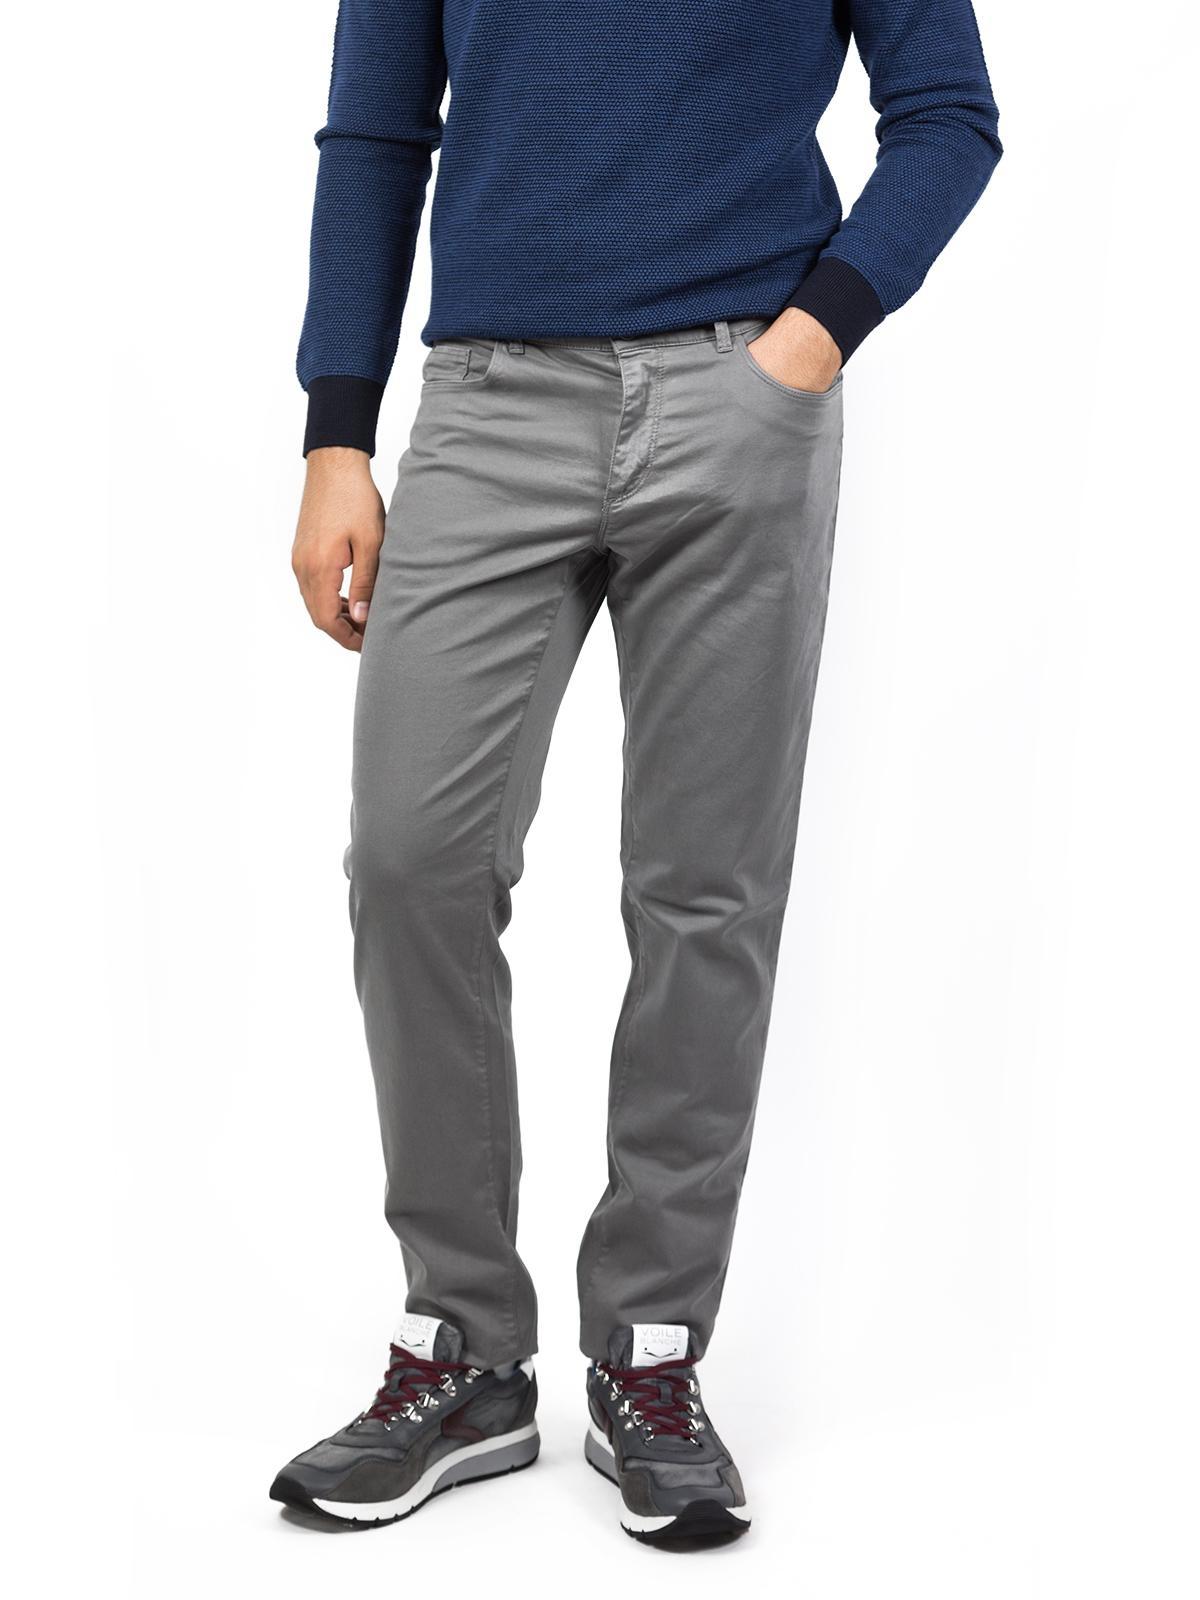 Trussardi - Pantalone - 52J00007 1Y091501